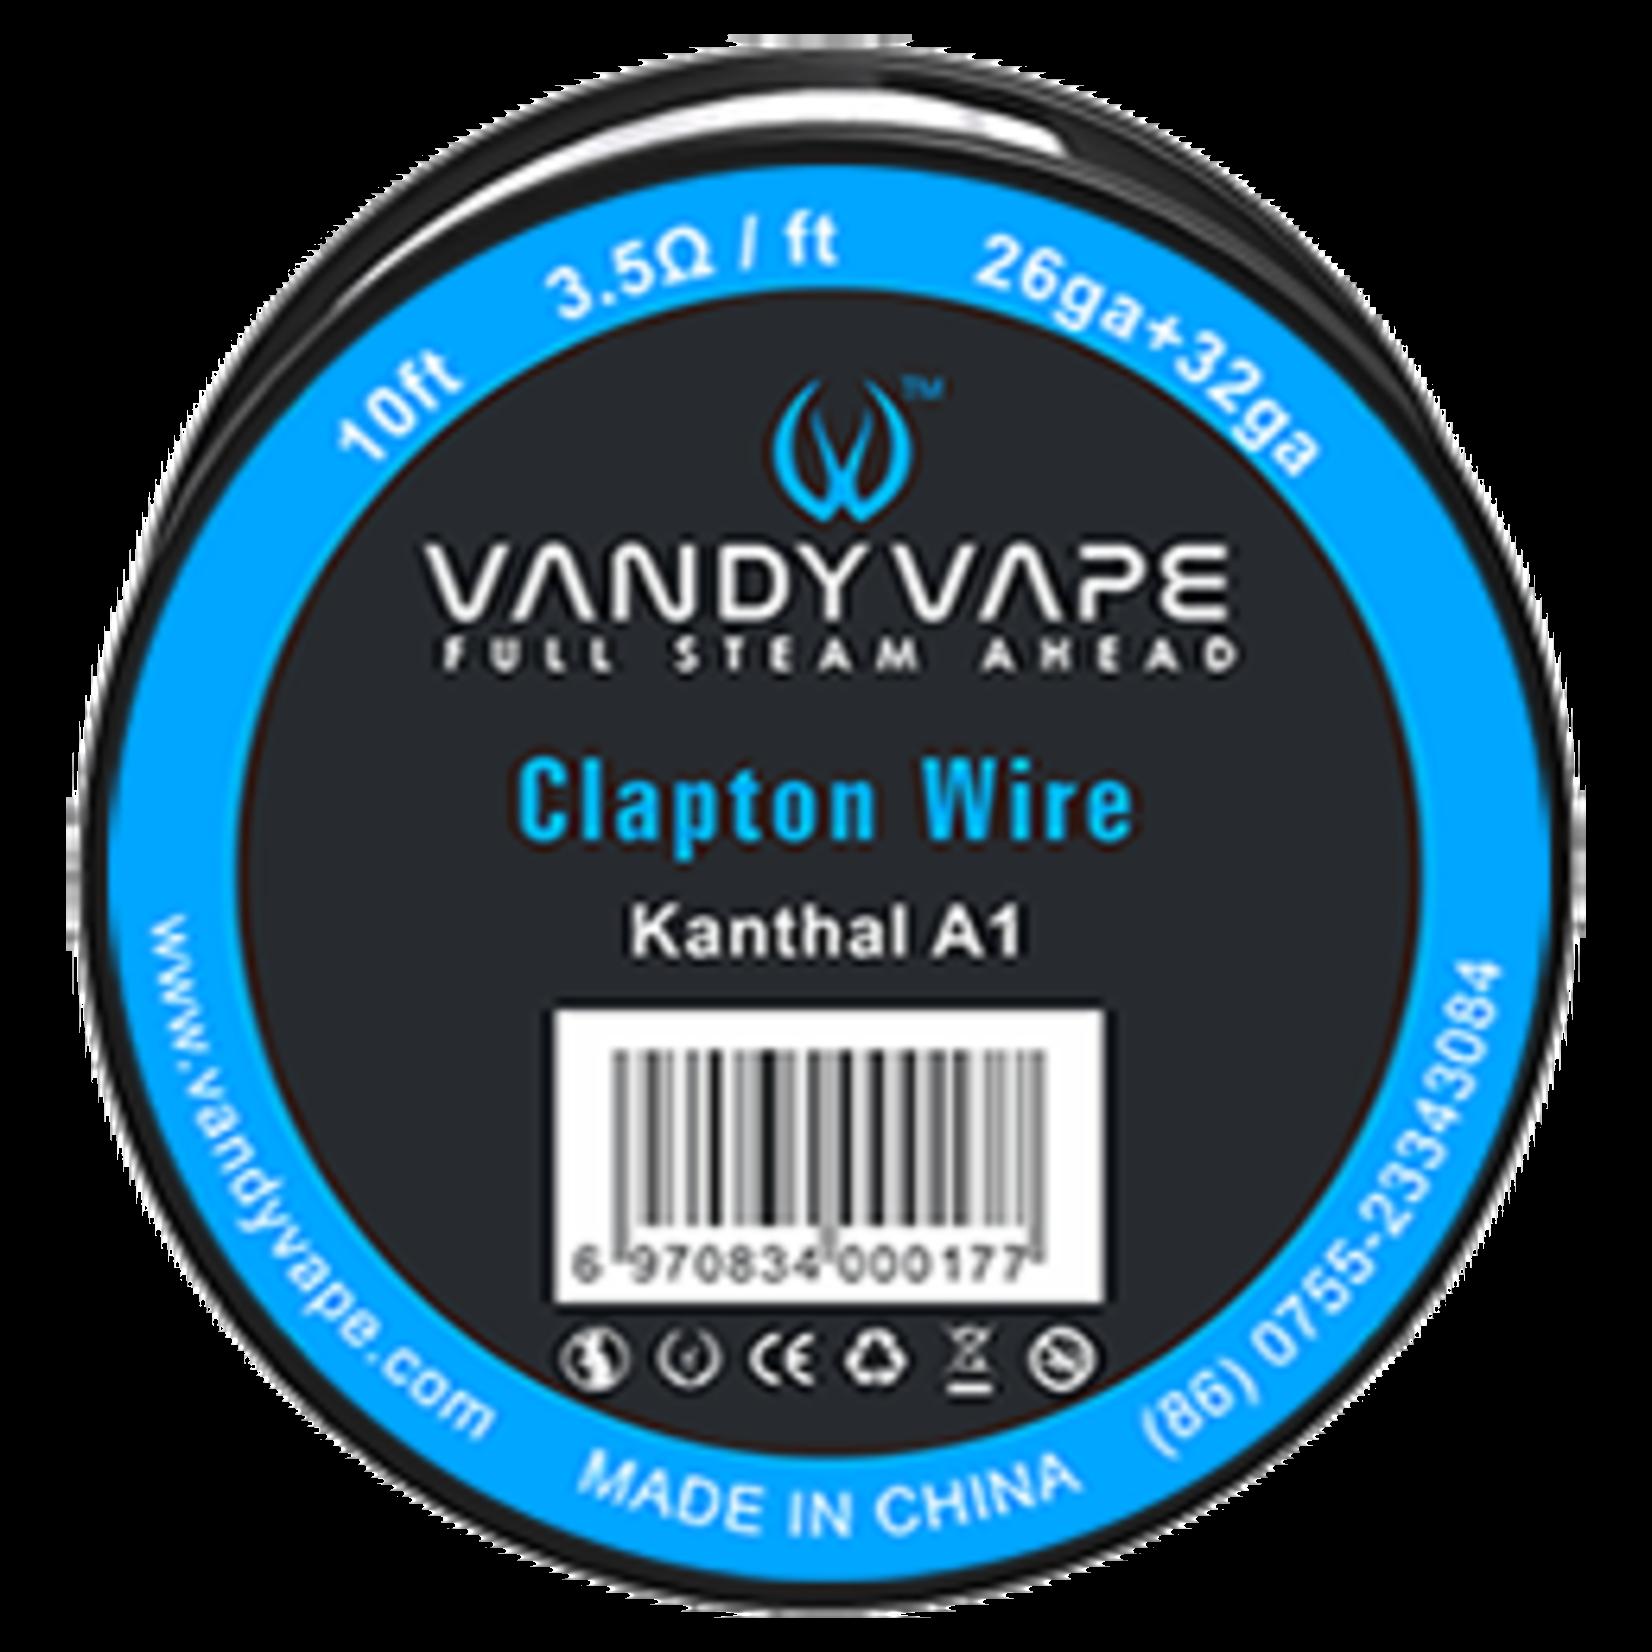 VandyVape Fused Clapton Wire 26ga & 32ga